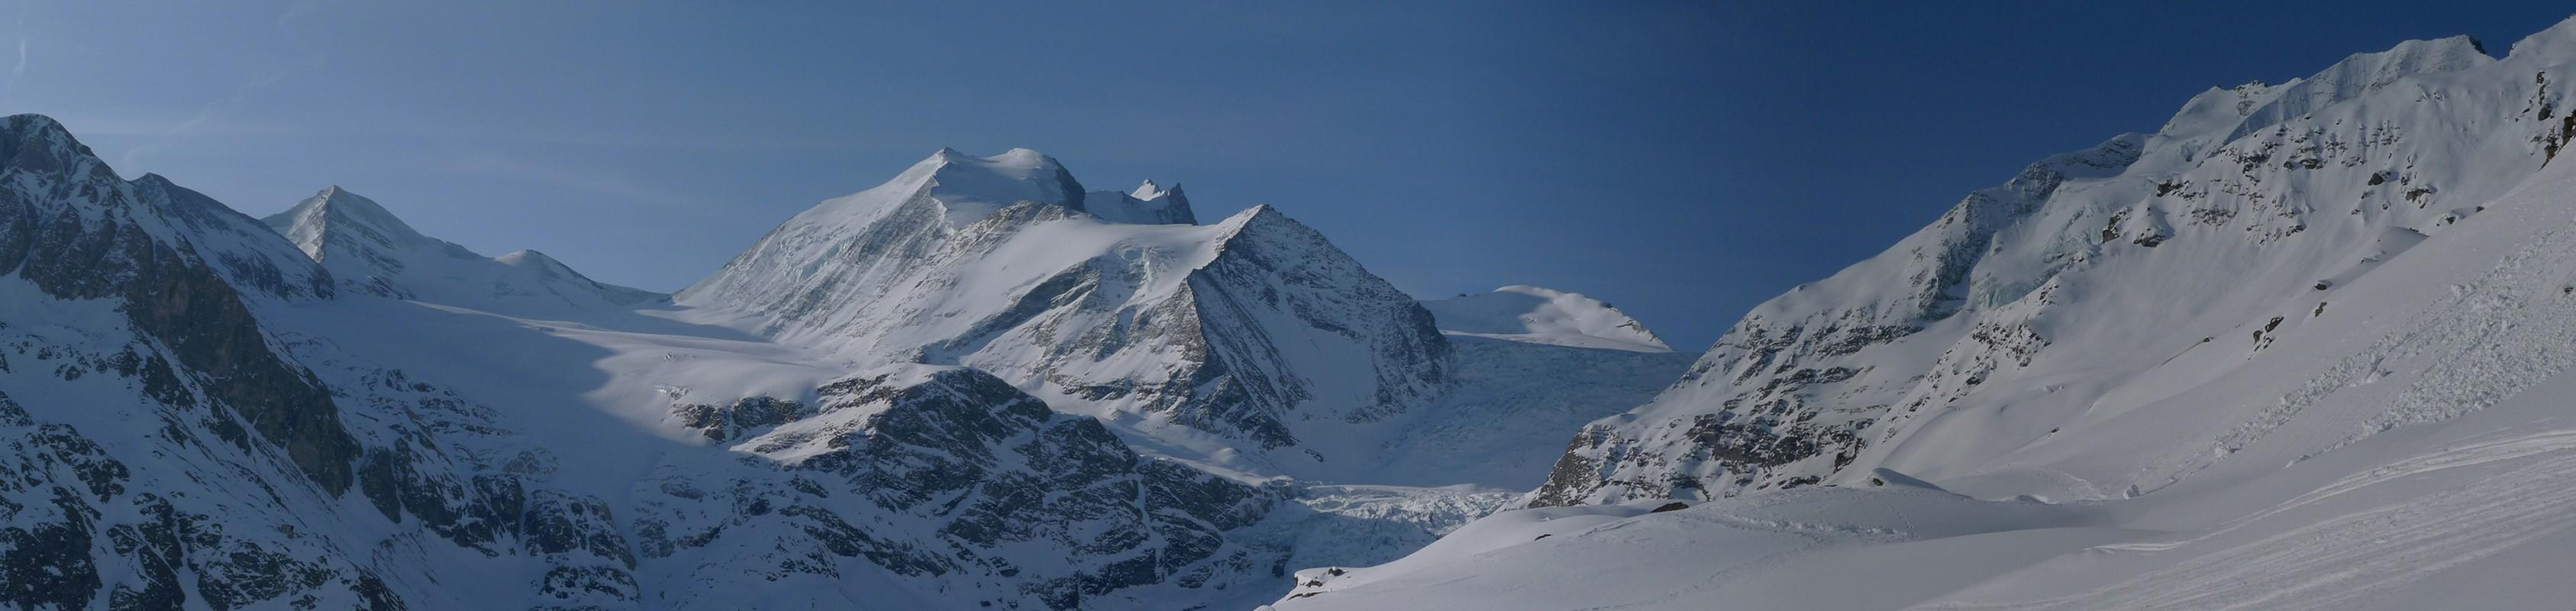 Turtmannhütte / Cabane Tourtemagne  Walliser Alpen / Alpes valaisannes Švýcarsko panorama 11